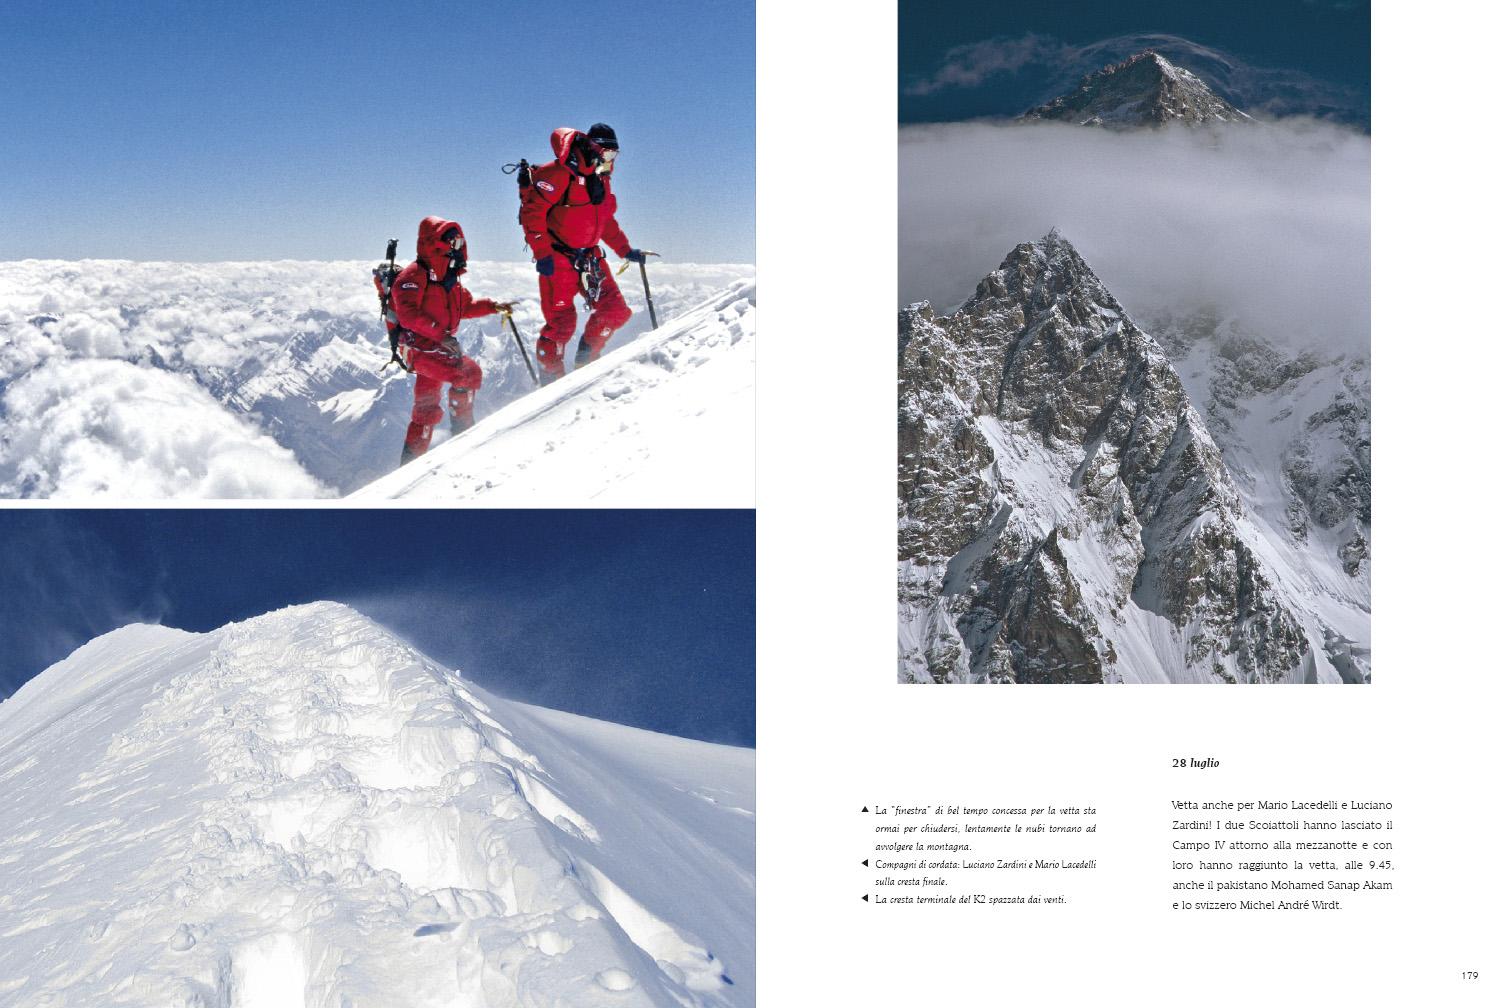 K2 EXPEDITION 1954-2004 Giuseppe Ghedina Fotografo - 091.jpg